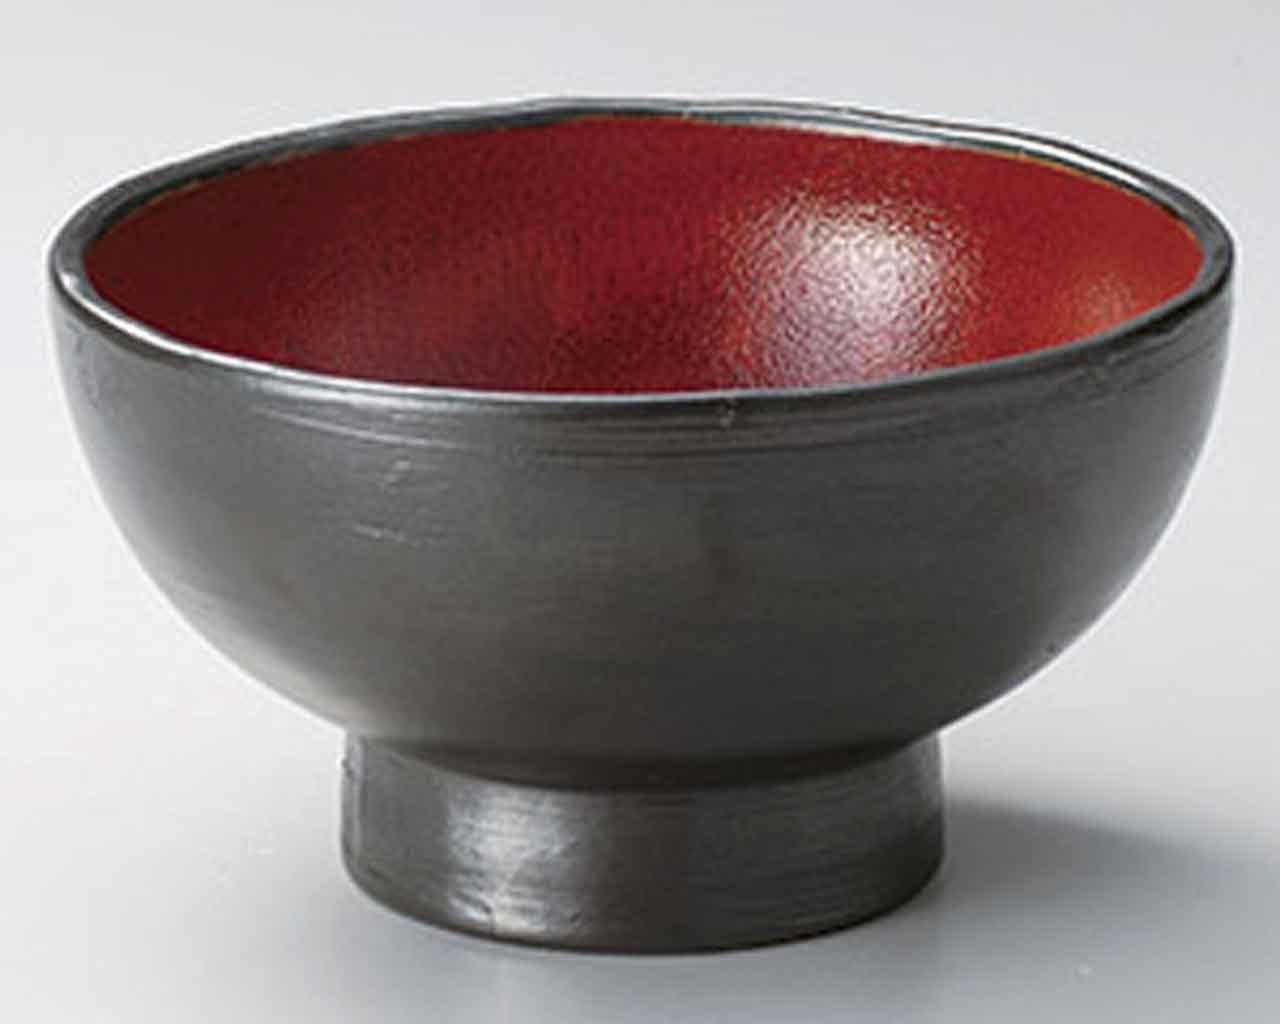 Japanesque 3.5inch Set of 10 Ramen-Bowls Black Ceramic Made in Japan